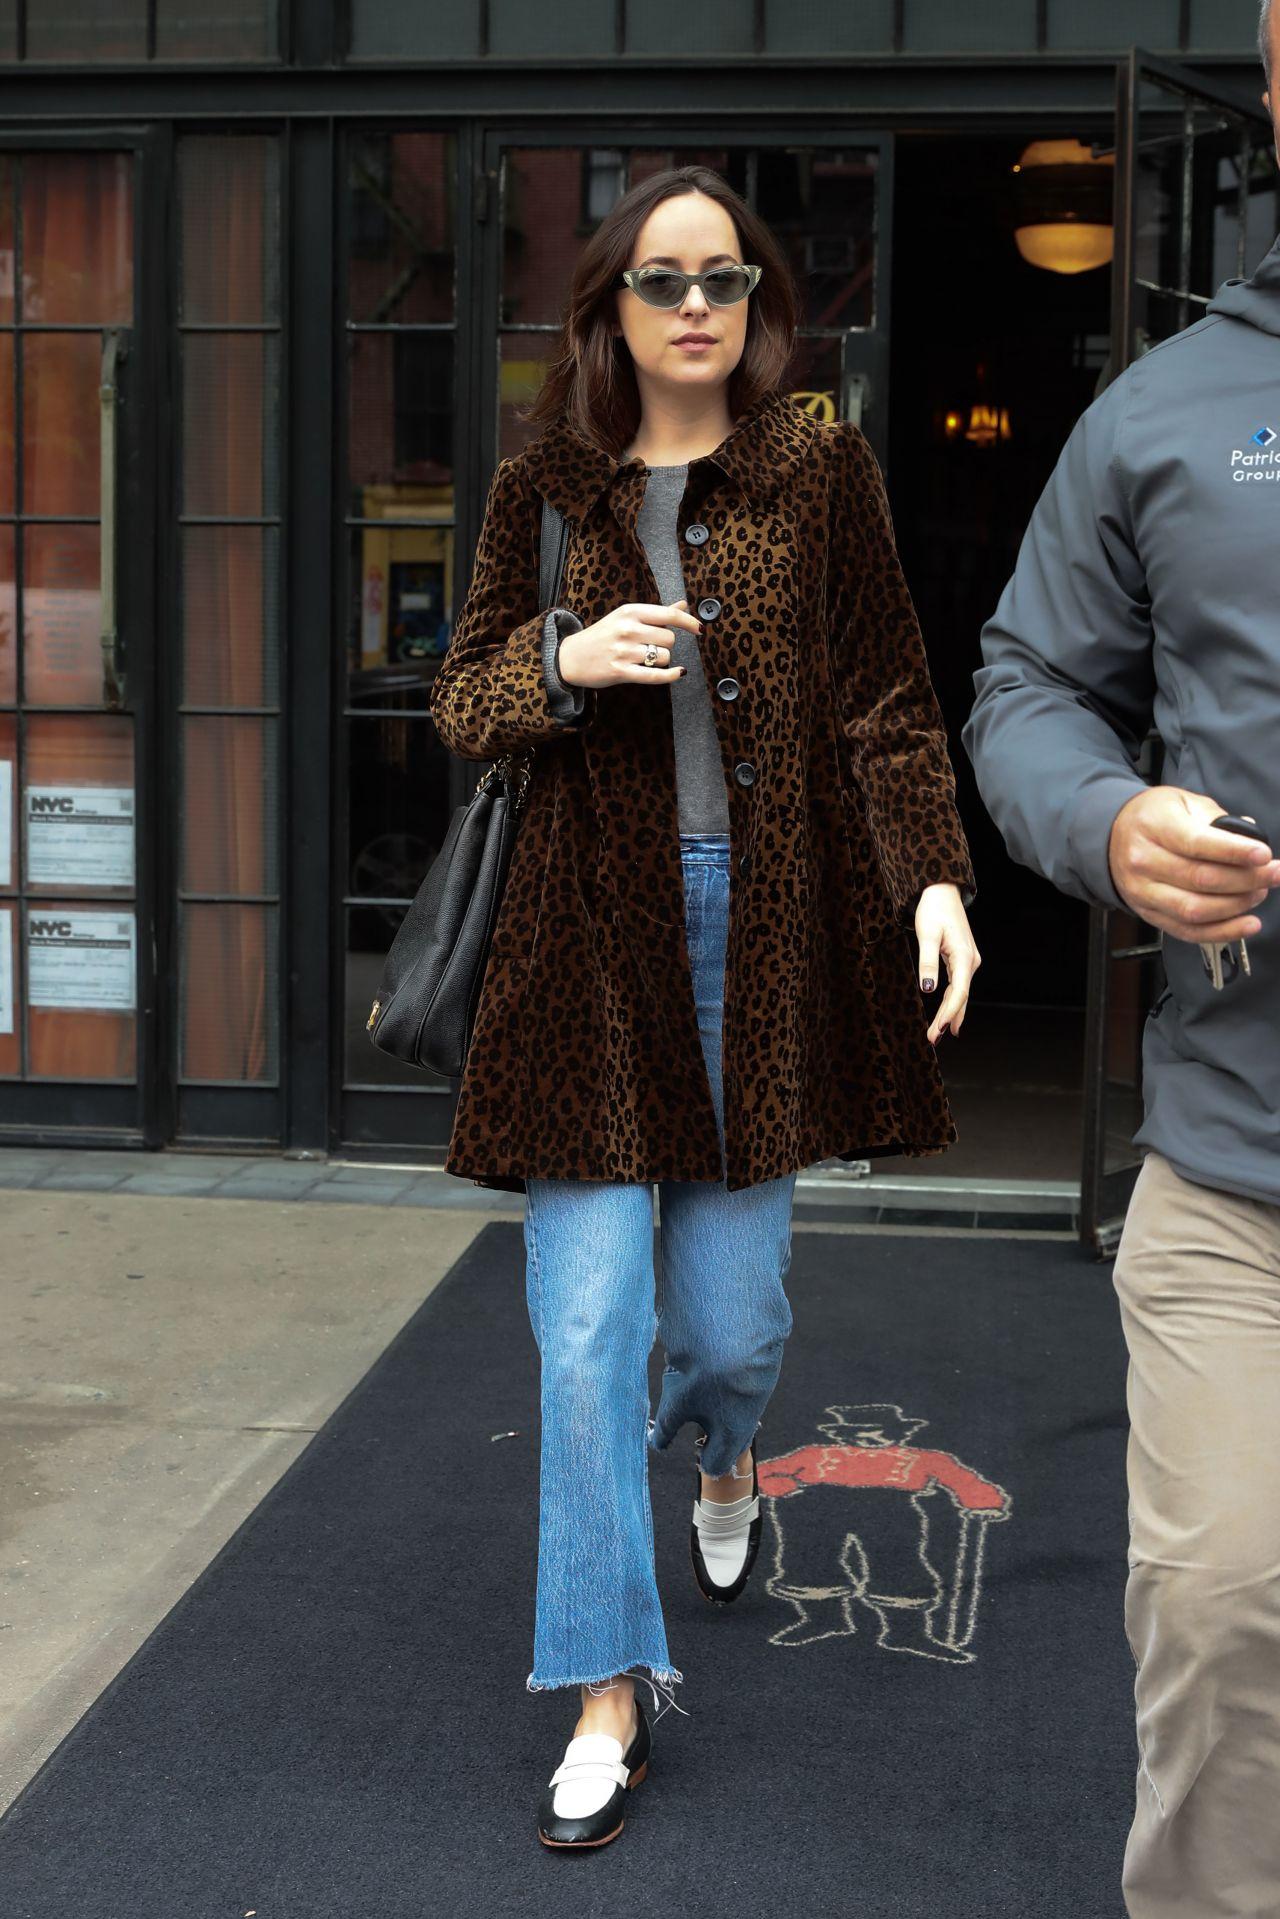 Dakota johnson leaving the bowery hotel in nyc nude (47 image)